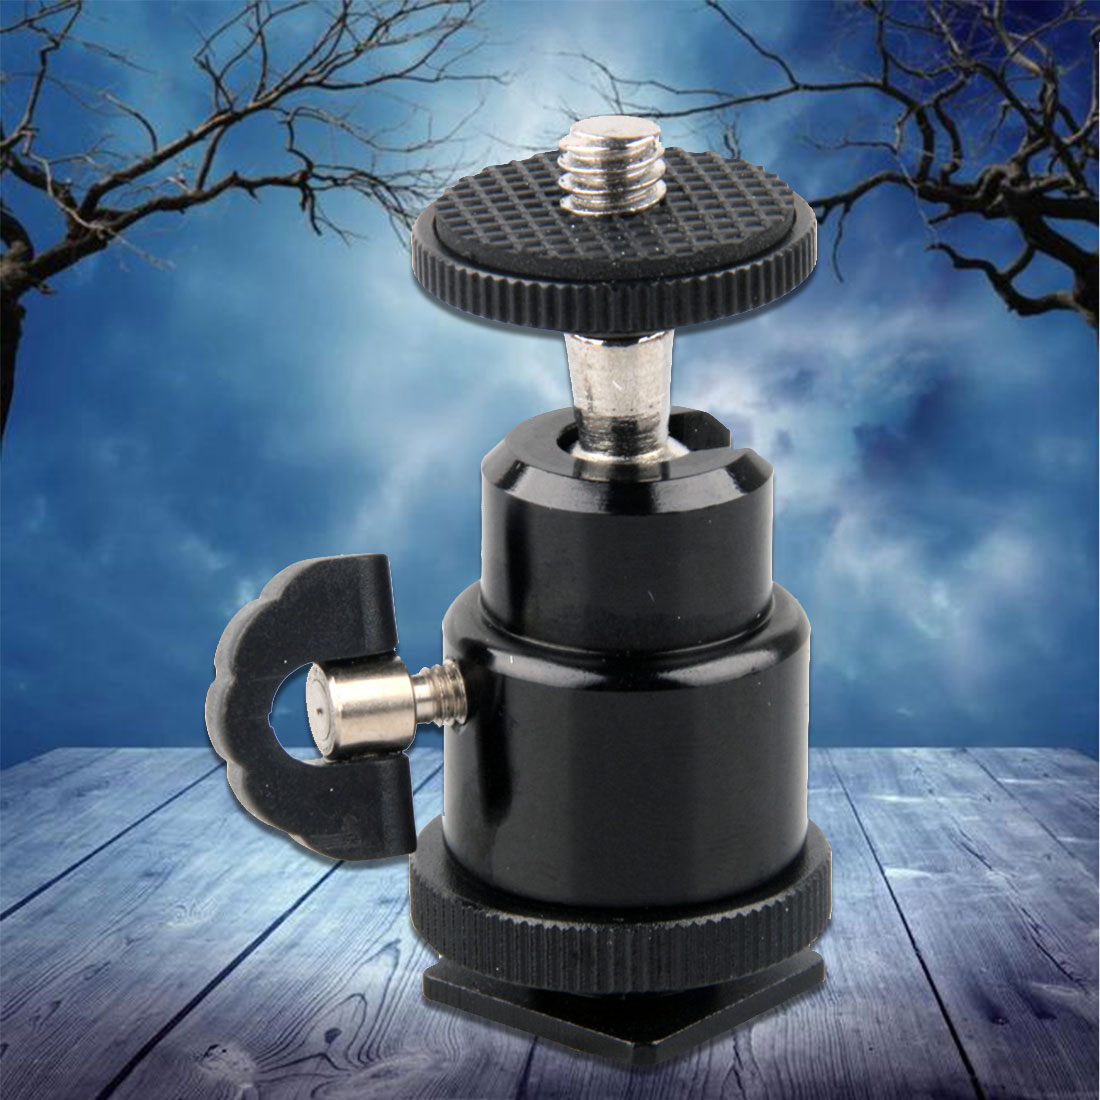 Centechia For Camera Tripod LED Light Flash Bracket Holder Mount 1/4 Hot Shoe Adapter Cradle Ball Head with Lock